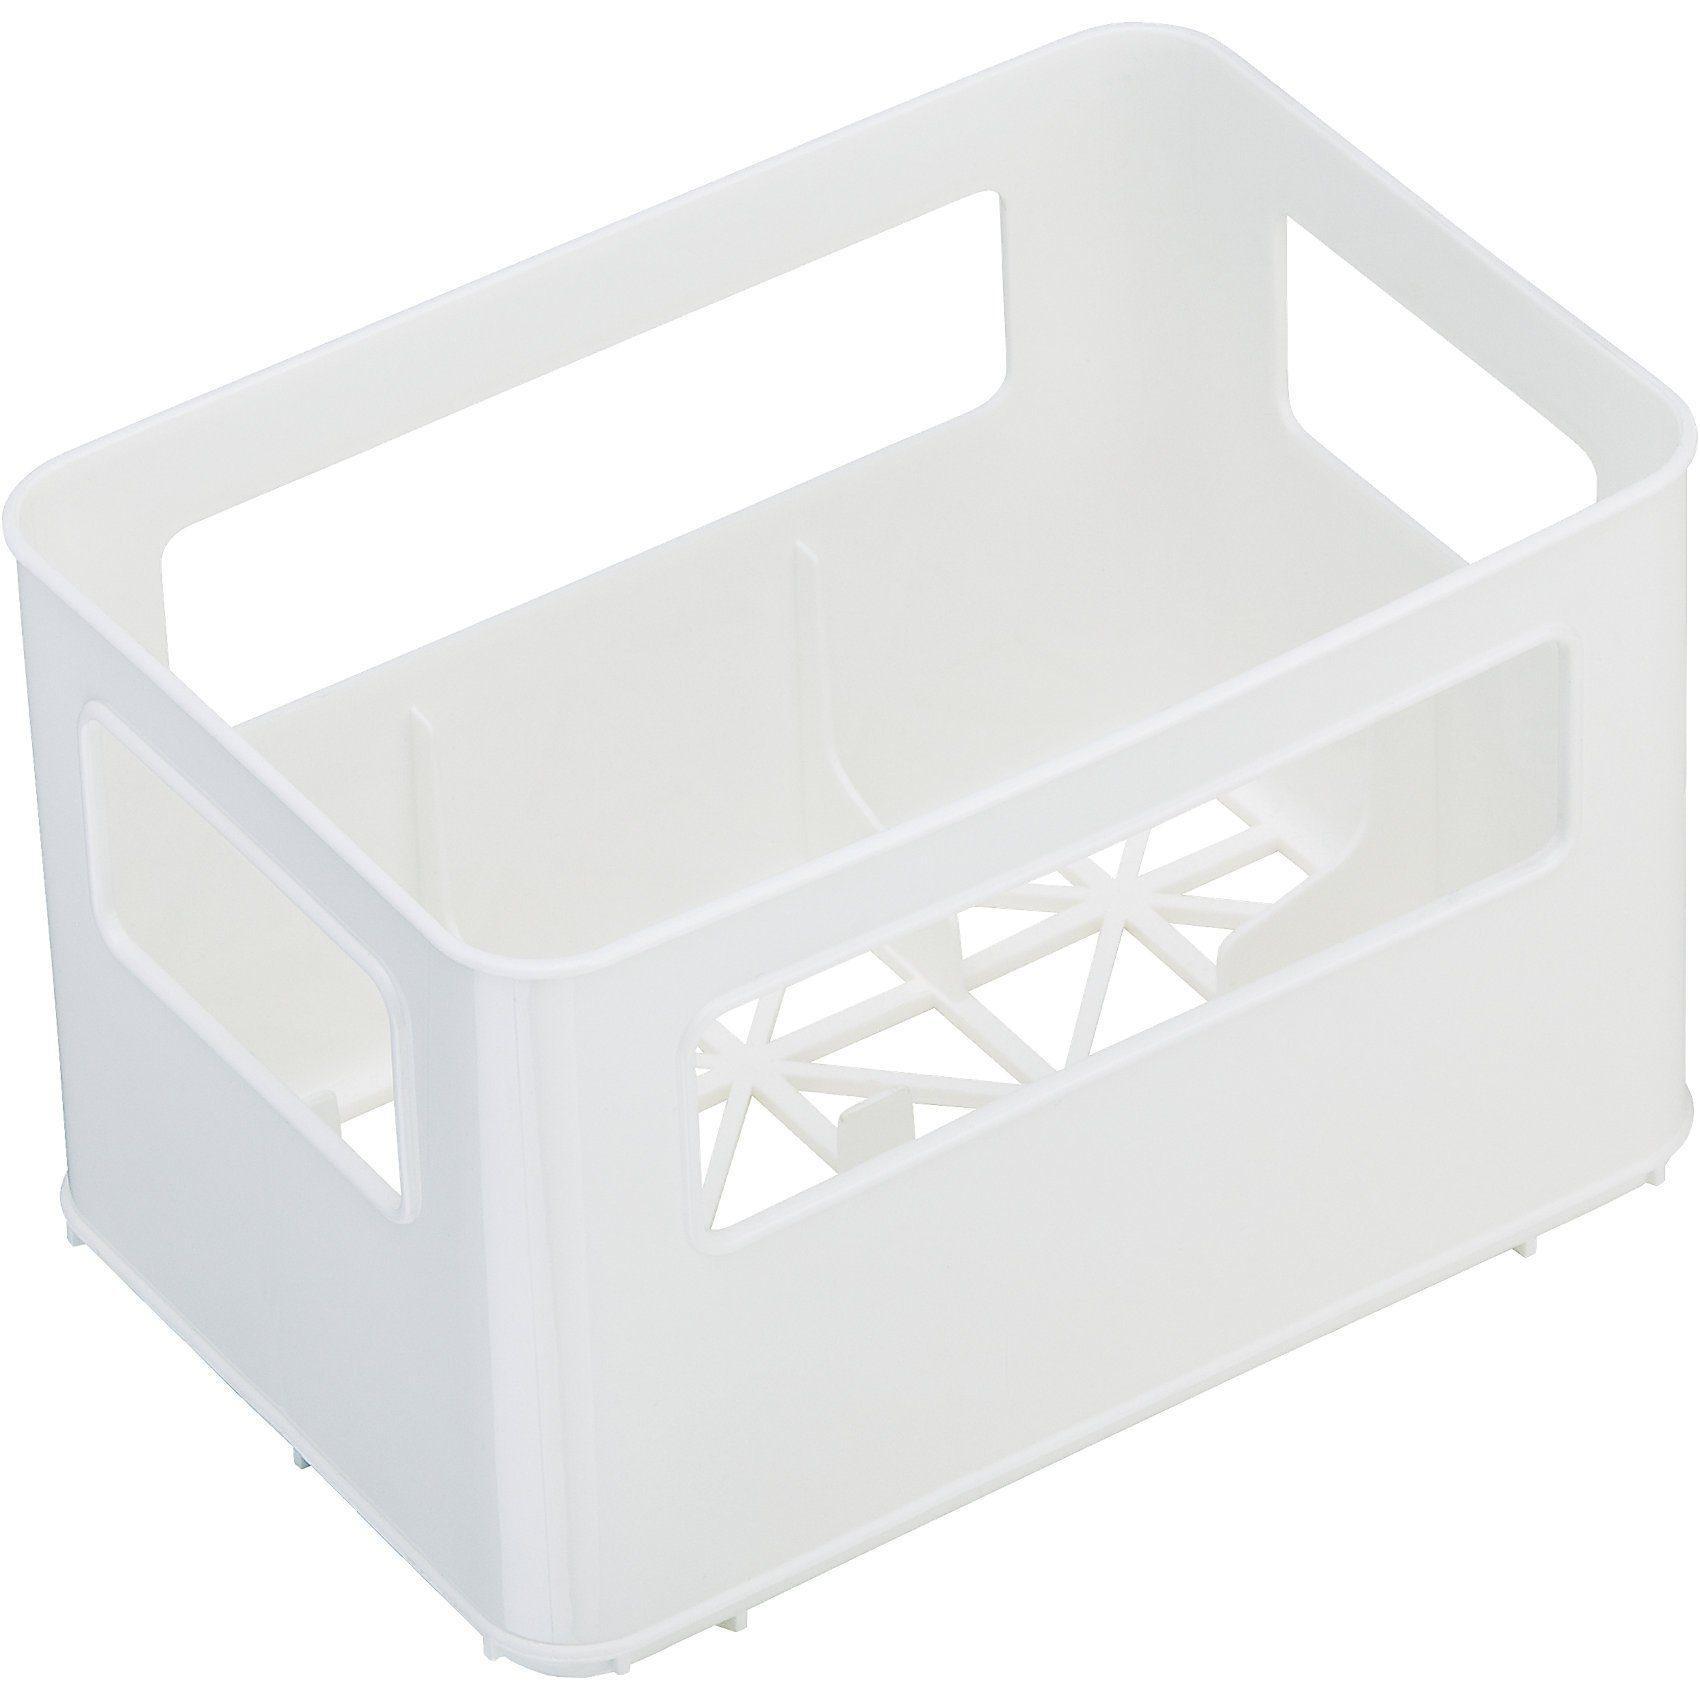 Rotho Babydesign Flaschenbox, weiß